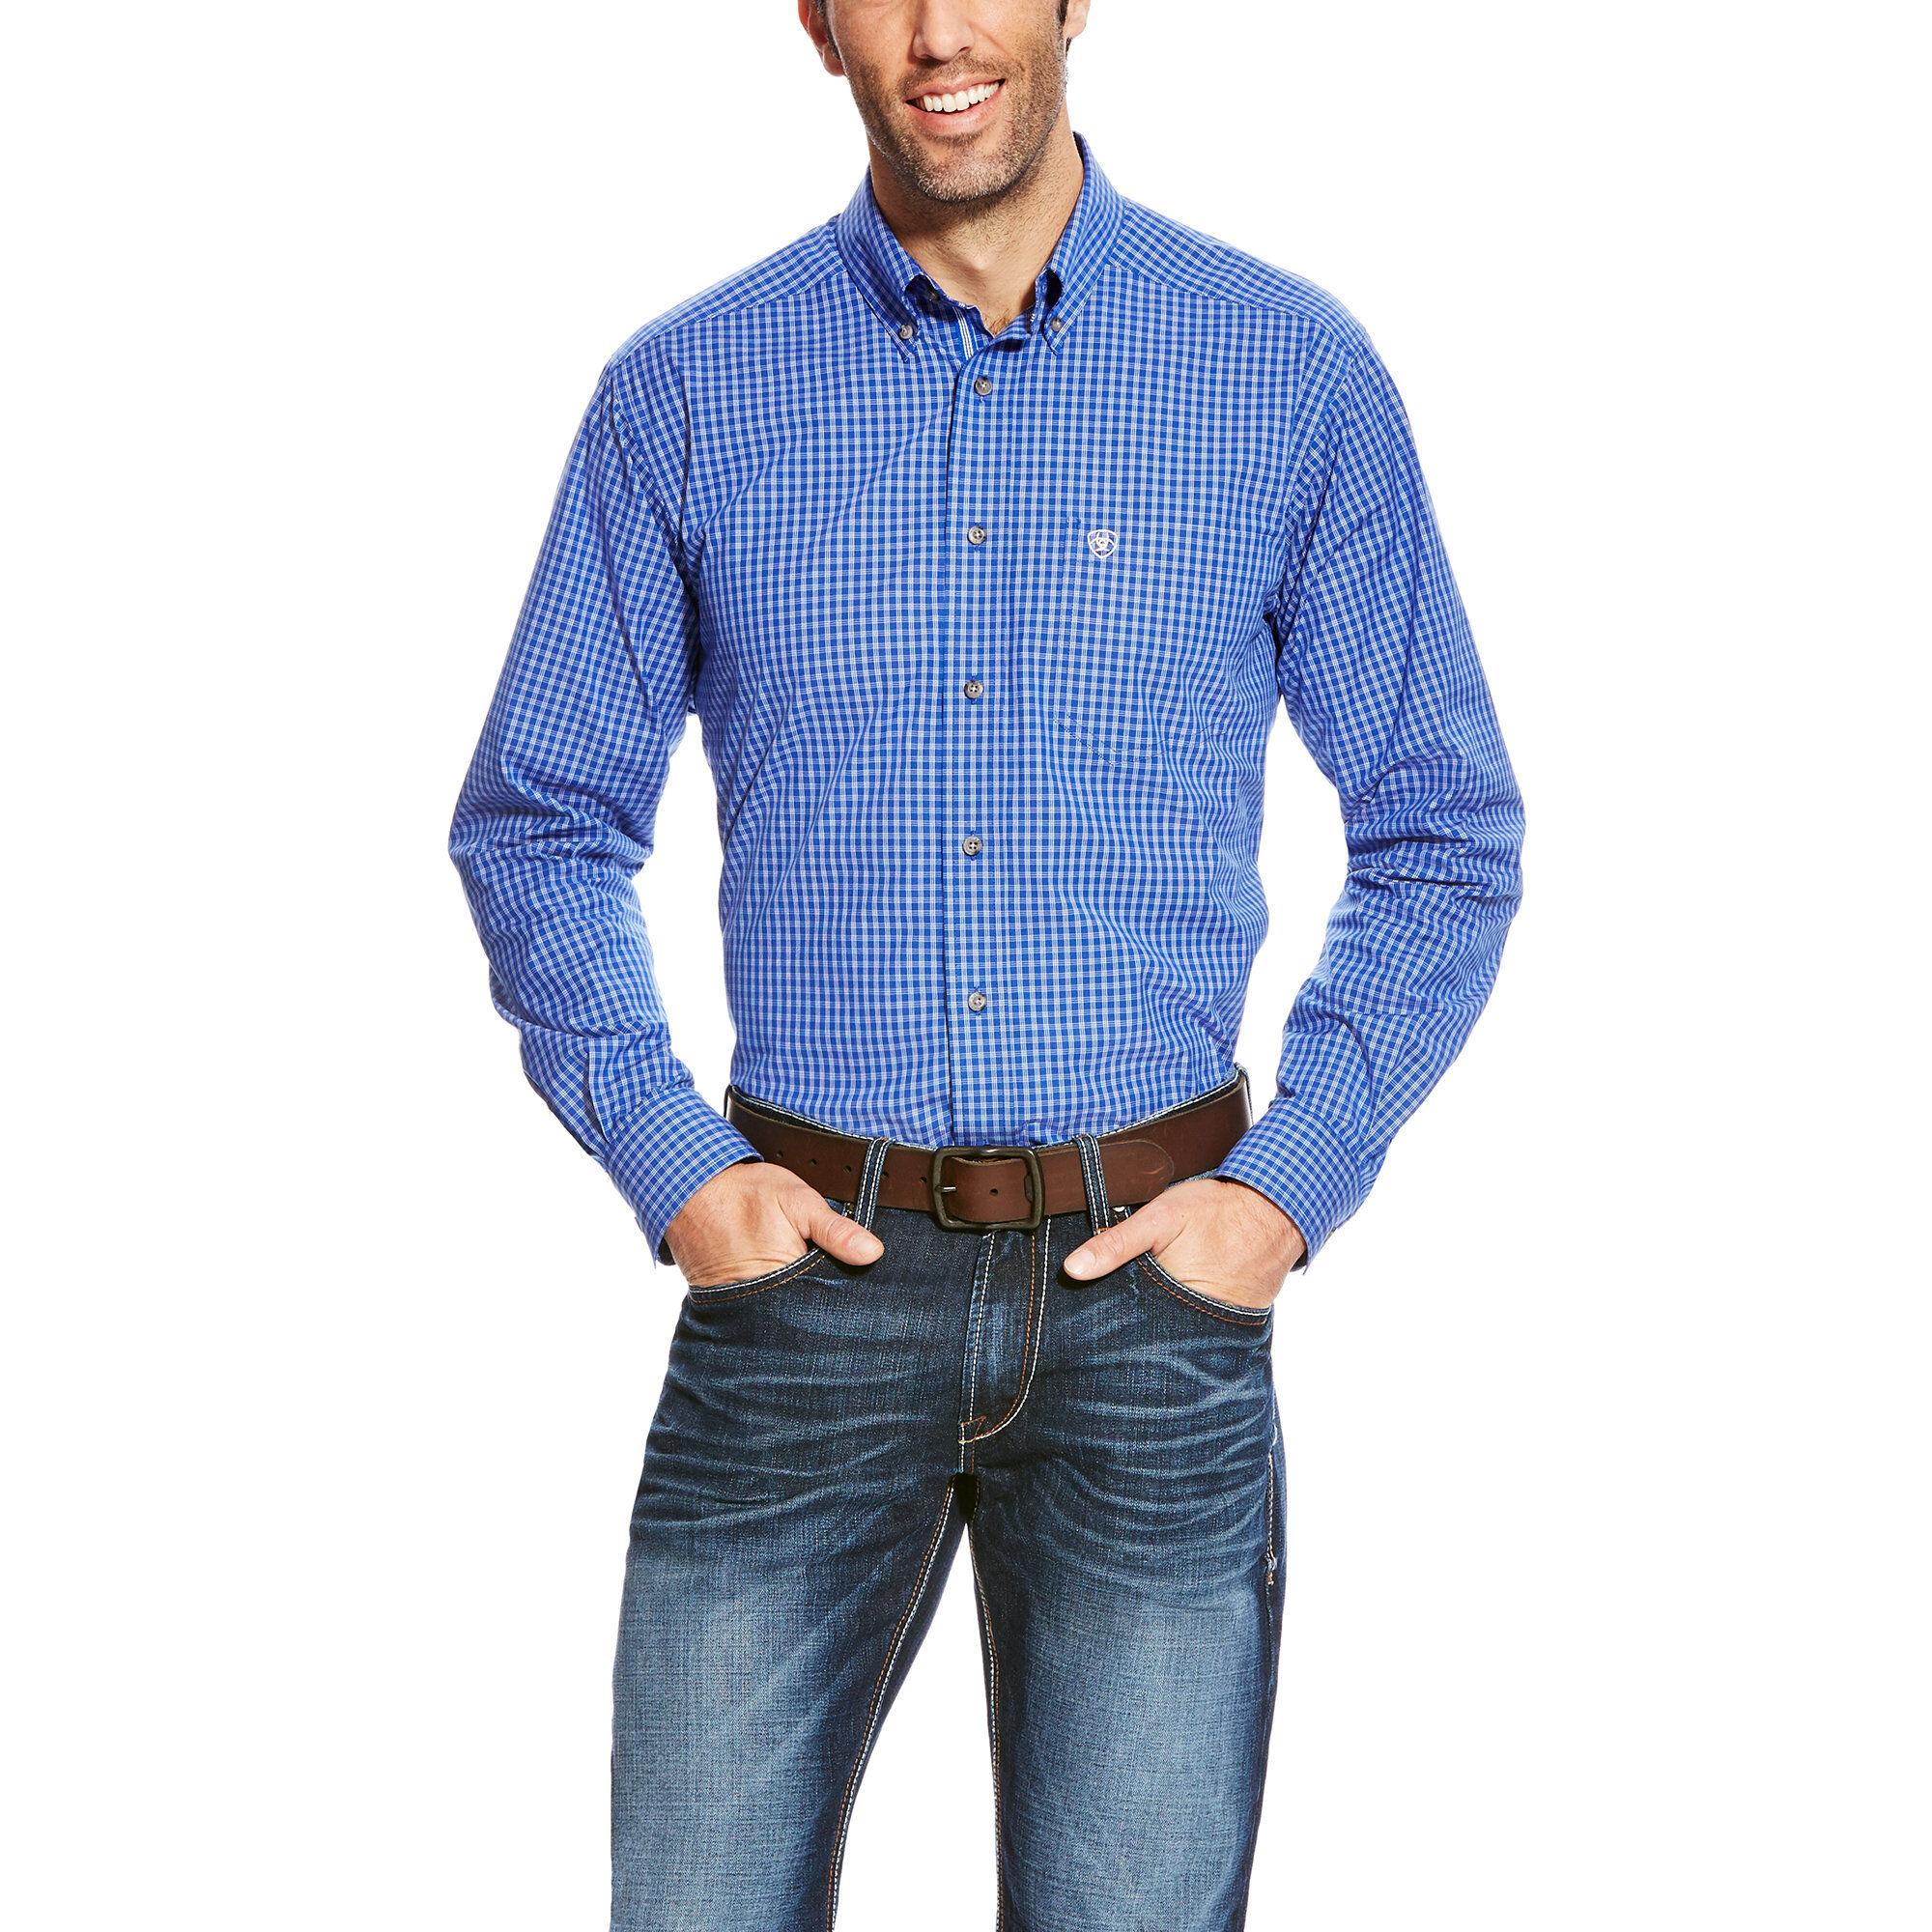 Barado Fitted Shirt